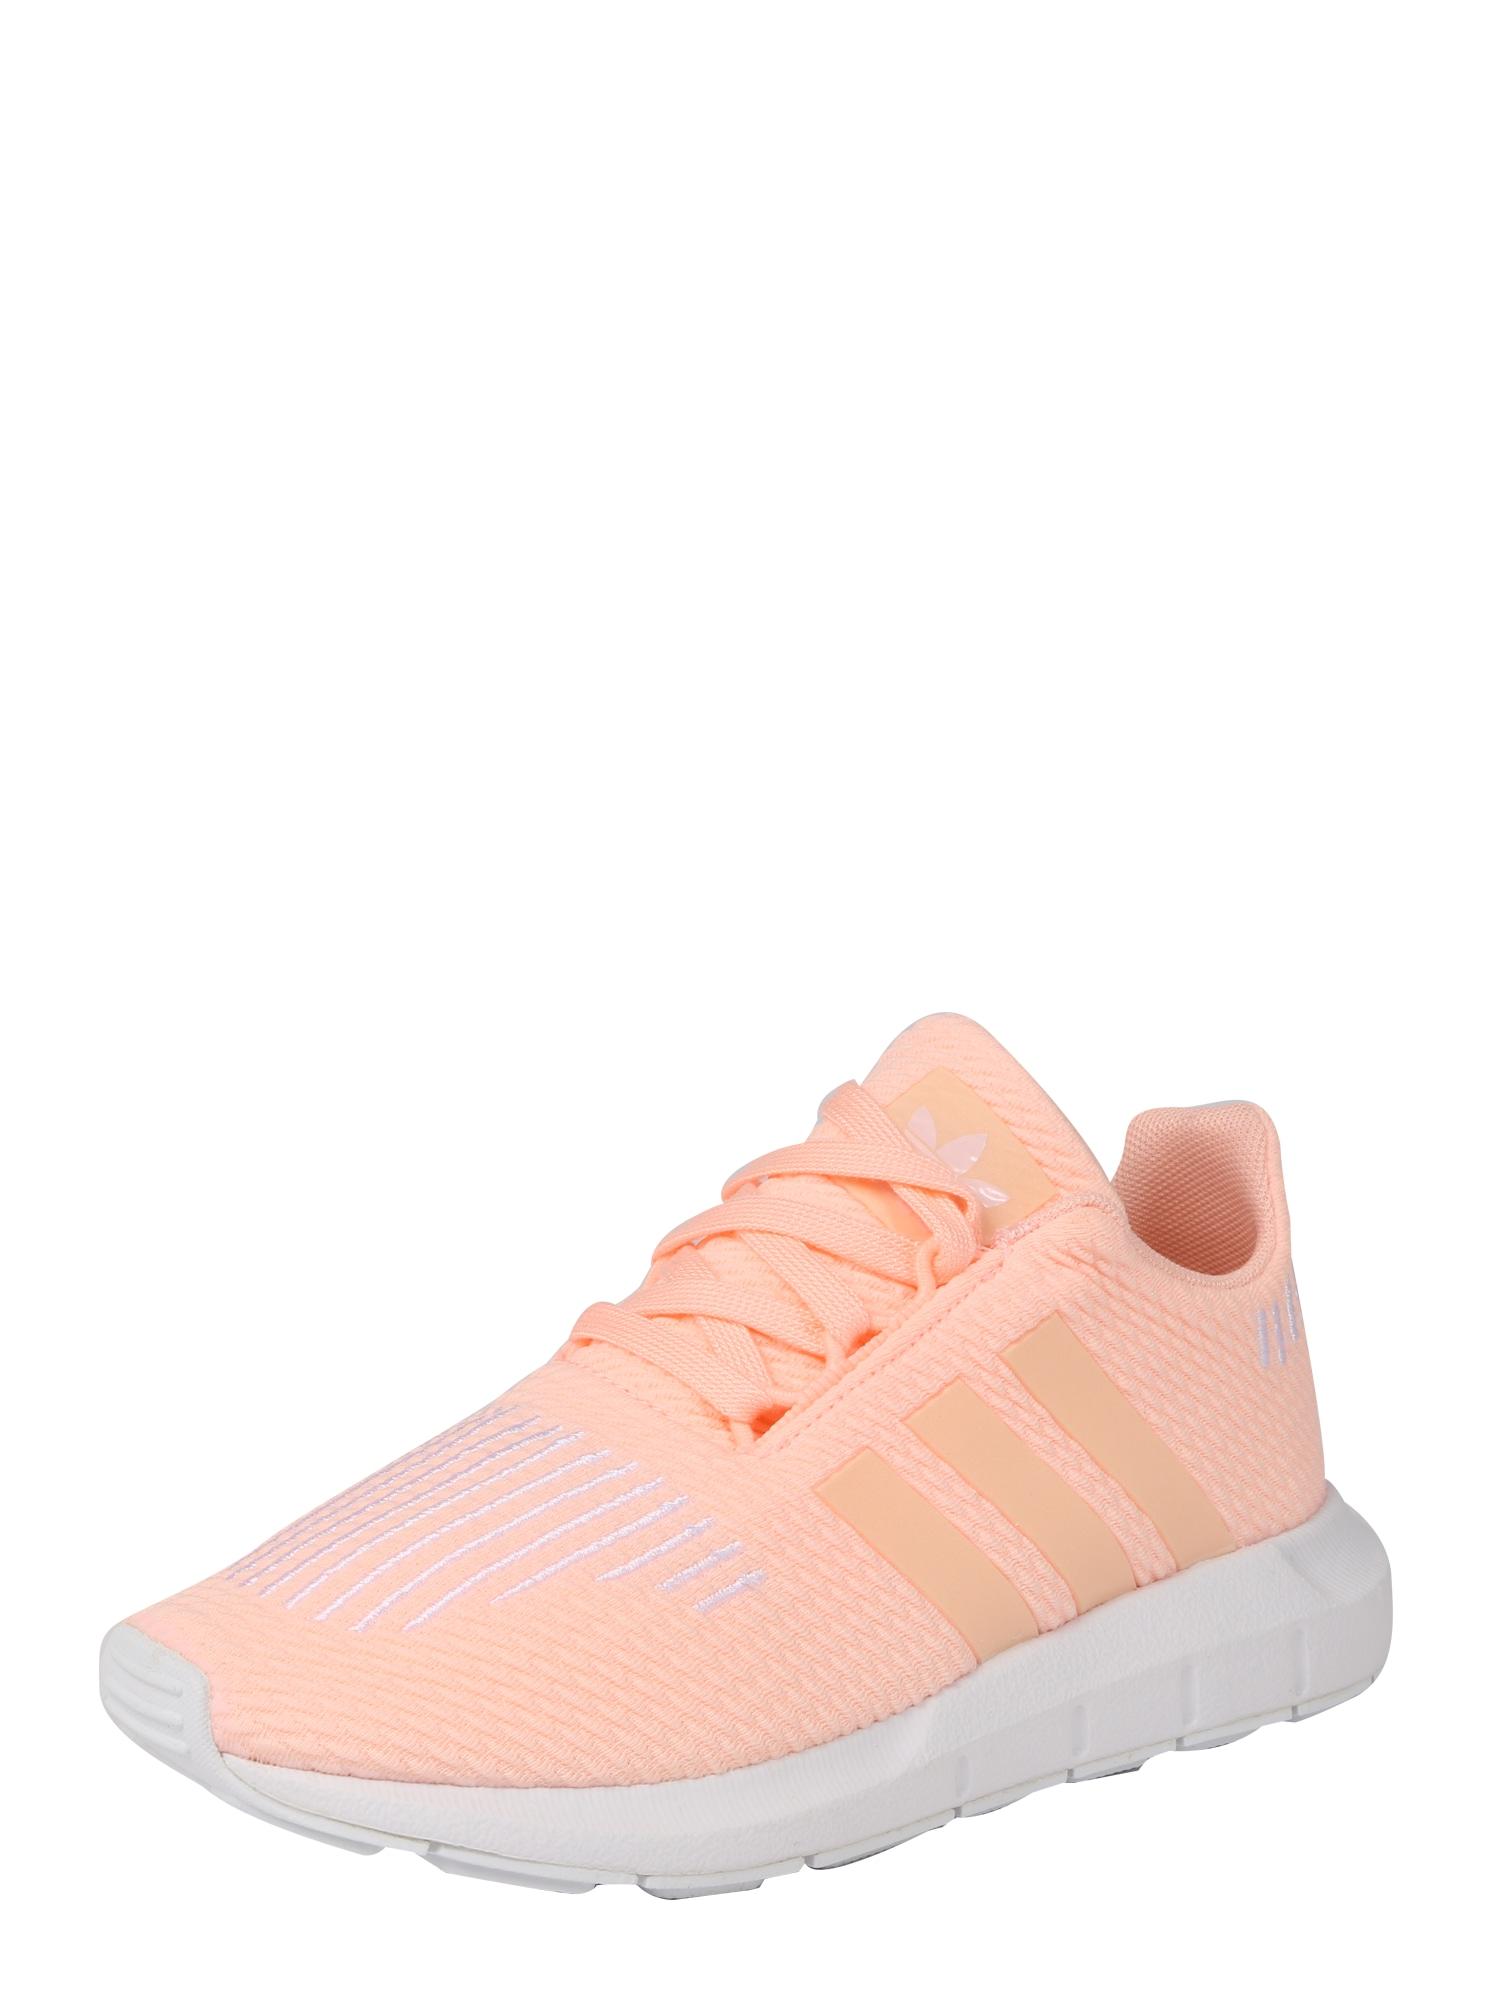 ADIDAS ORIGINALS, Meisjes Sneakers 'SWIFT RUN C', rosa